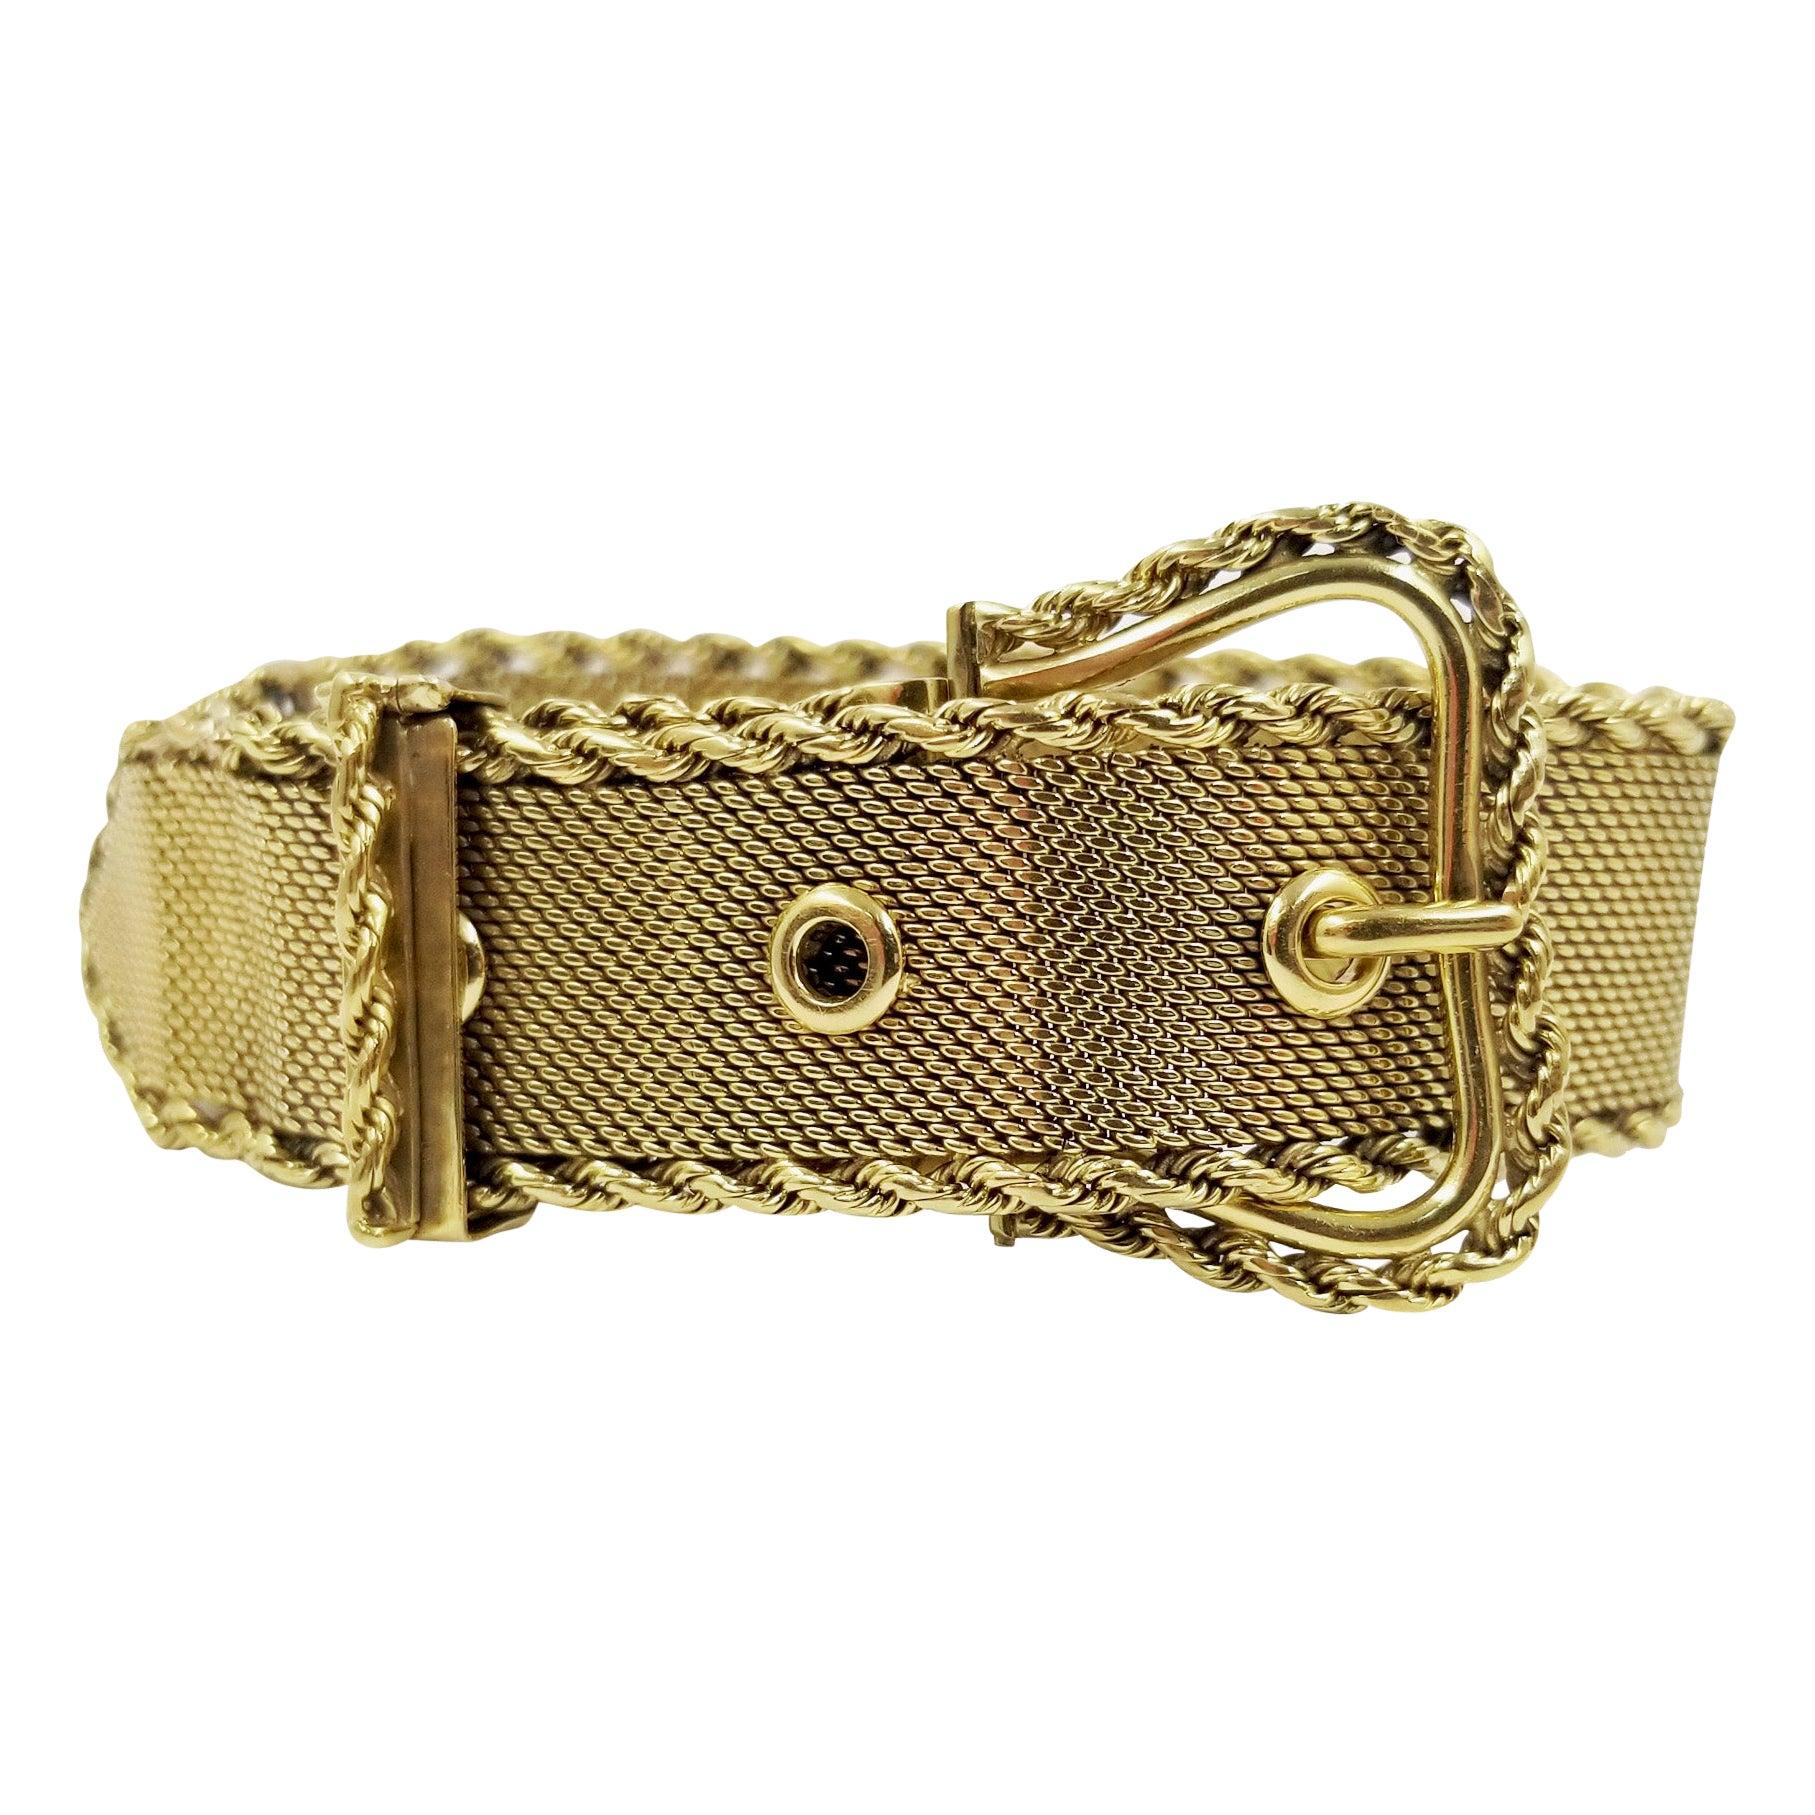 Wide 18 Karat Yellow Gold Antique Mesh Buckle Bracelet